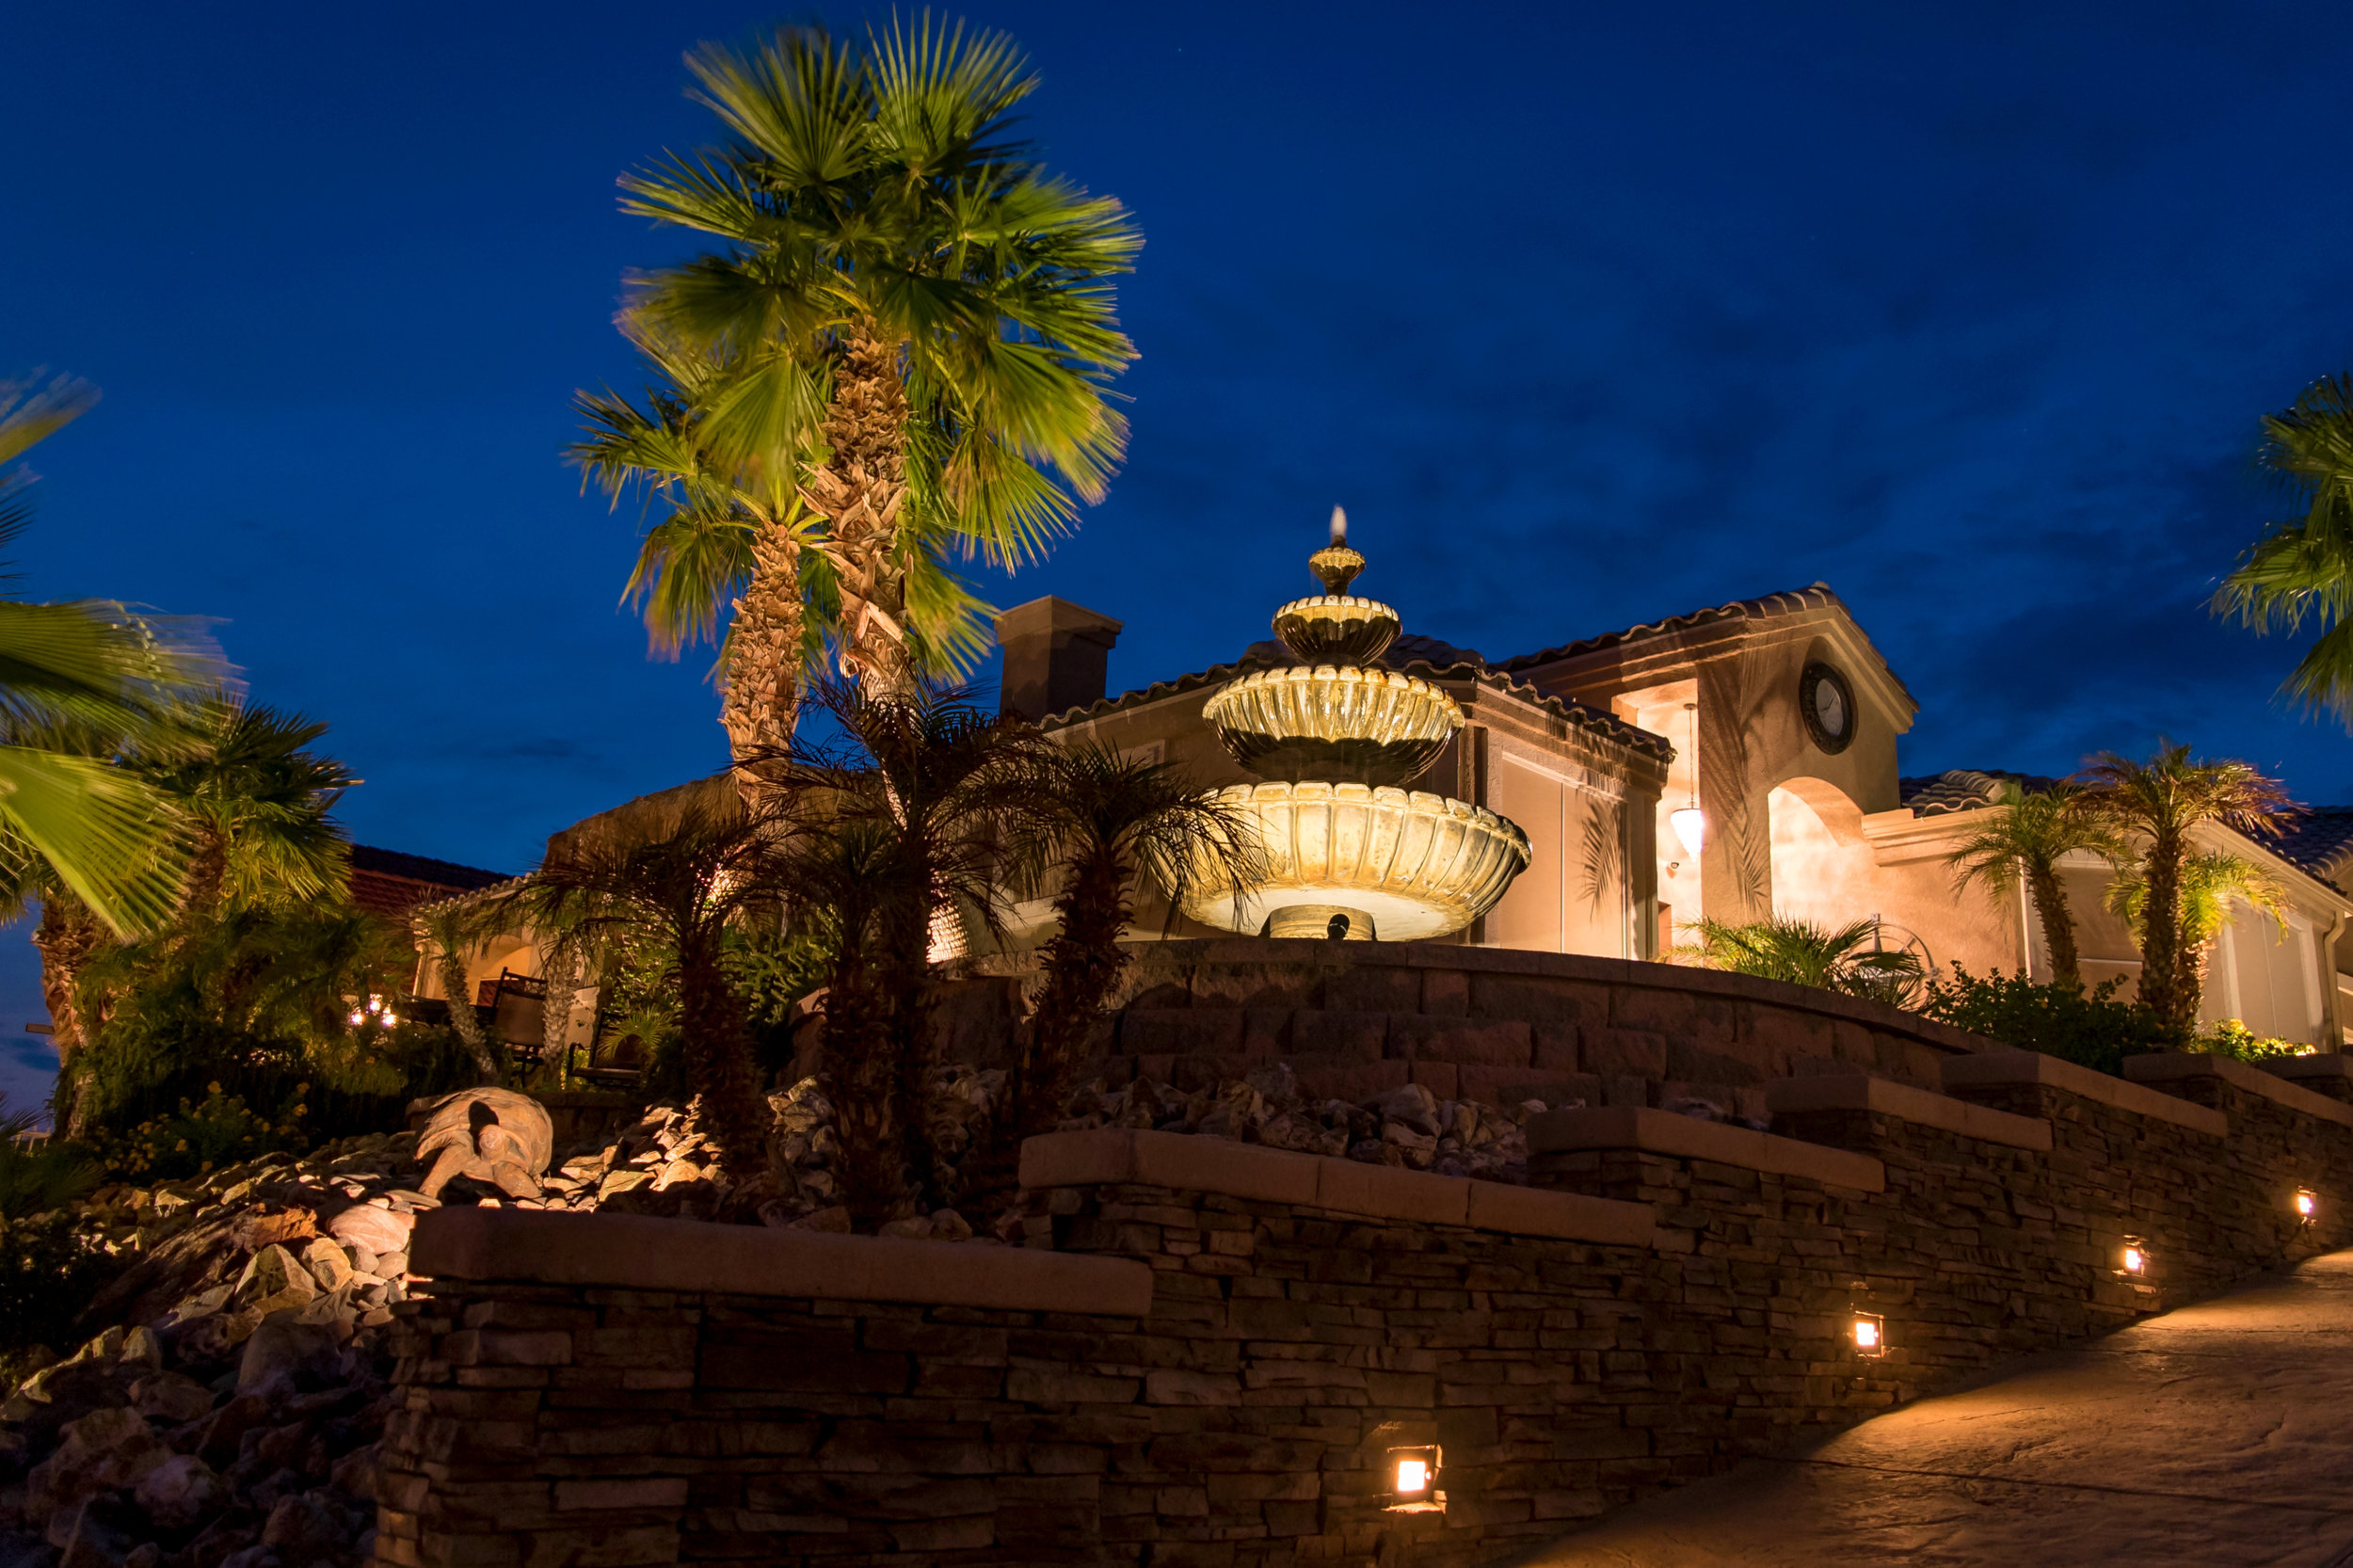 Realty-Pegasus Ranch-2049-Nickey's-Photo-Creations-Photographer-Bullhead- City-AZ-215.jpg